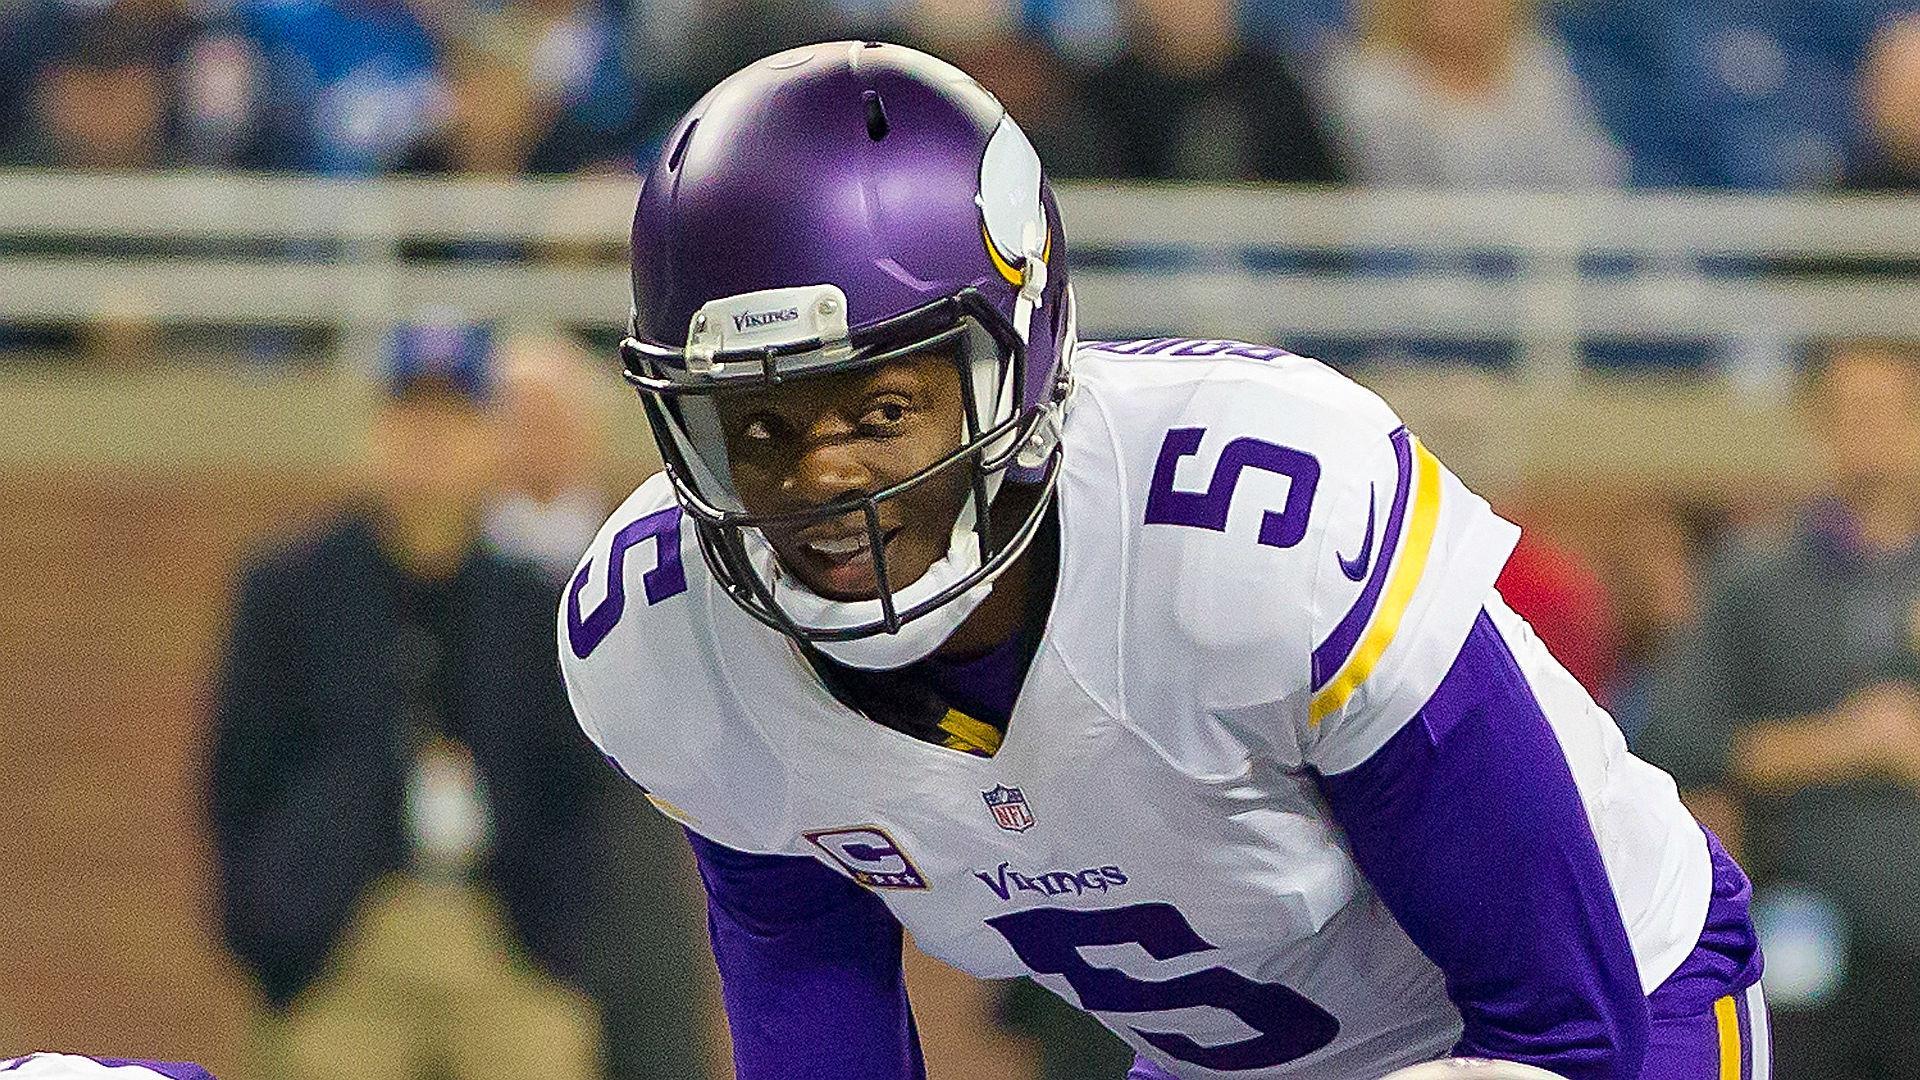 Teddy Bridgewater injury update: Vikings expect QB to miss 2017, too, report says